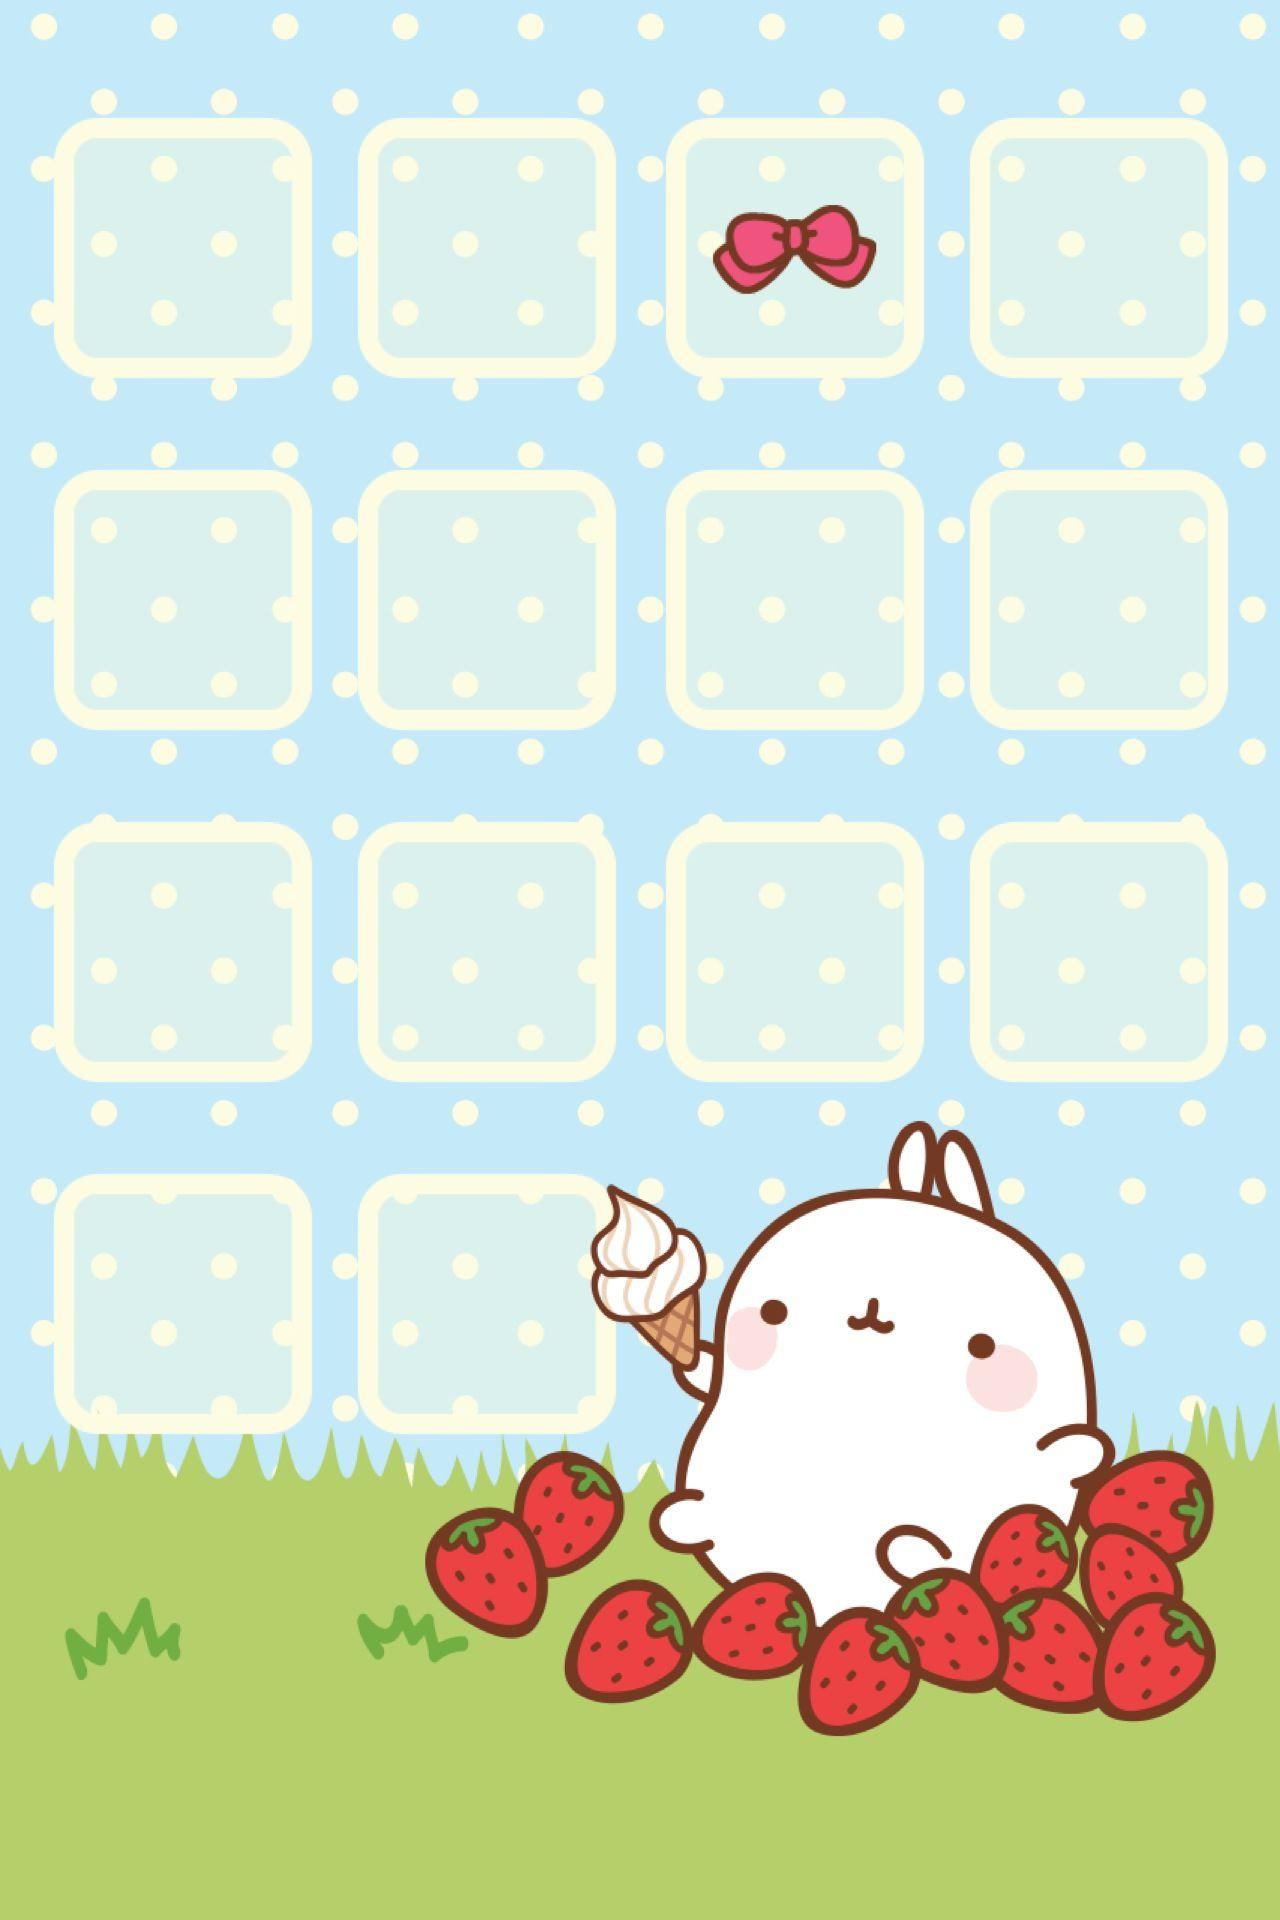 Must see Wallpaper Home Screen Cute - 4317b2278c6c1292bf633a68633cf0cb  Pic_11943.jpg